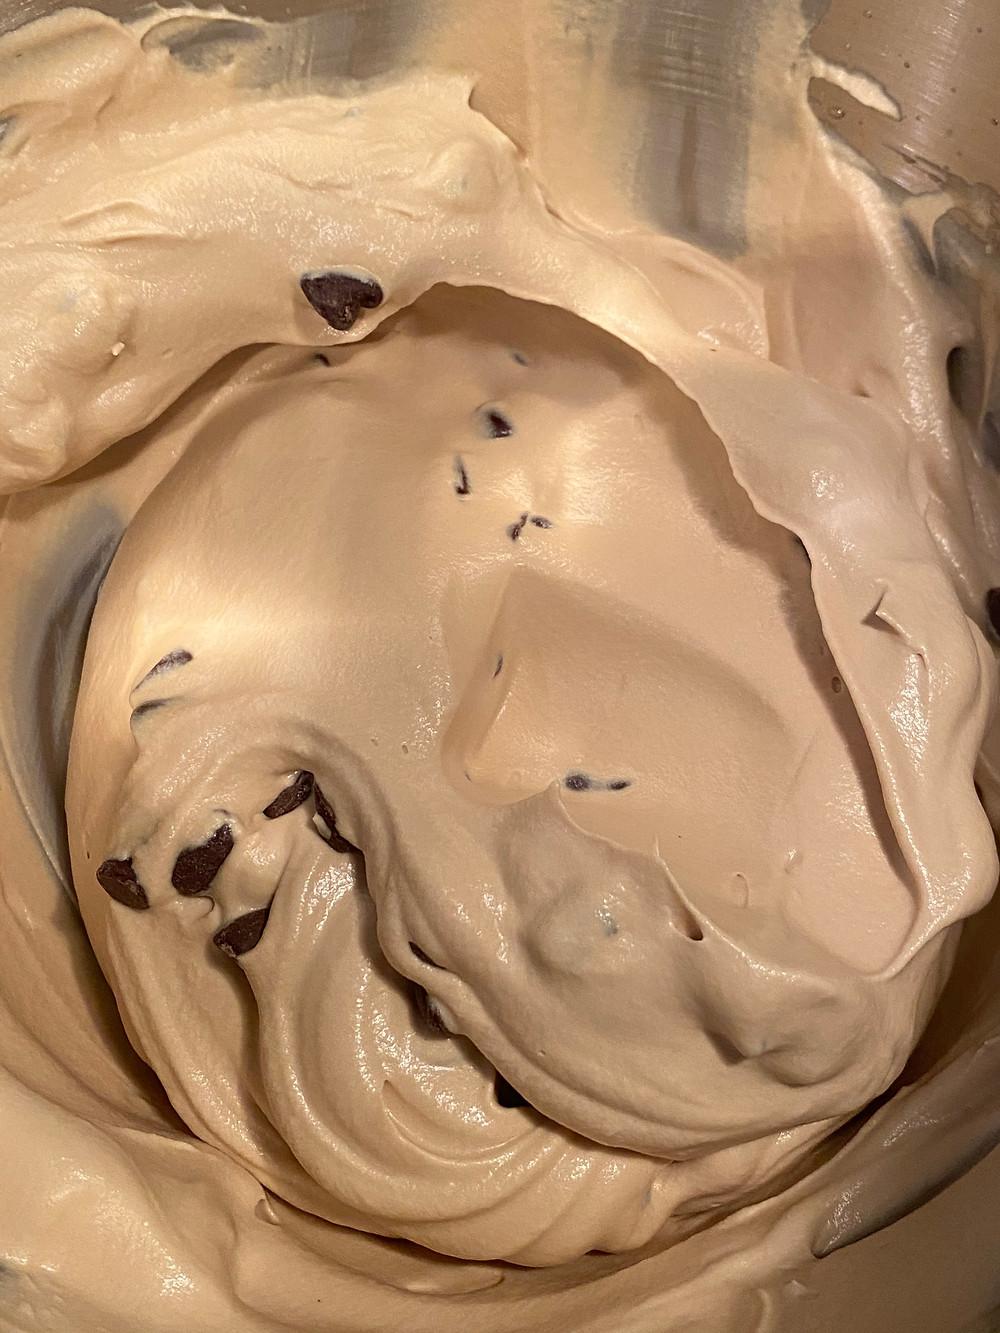 Kahlua coffee chip no churn ice cream